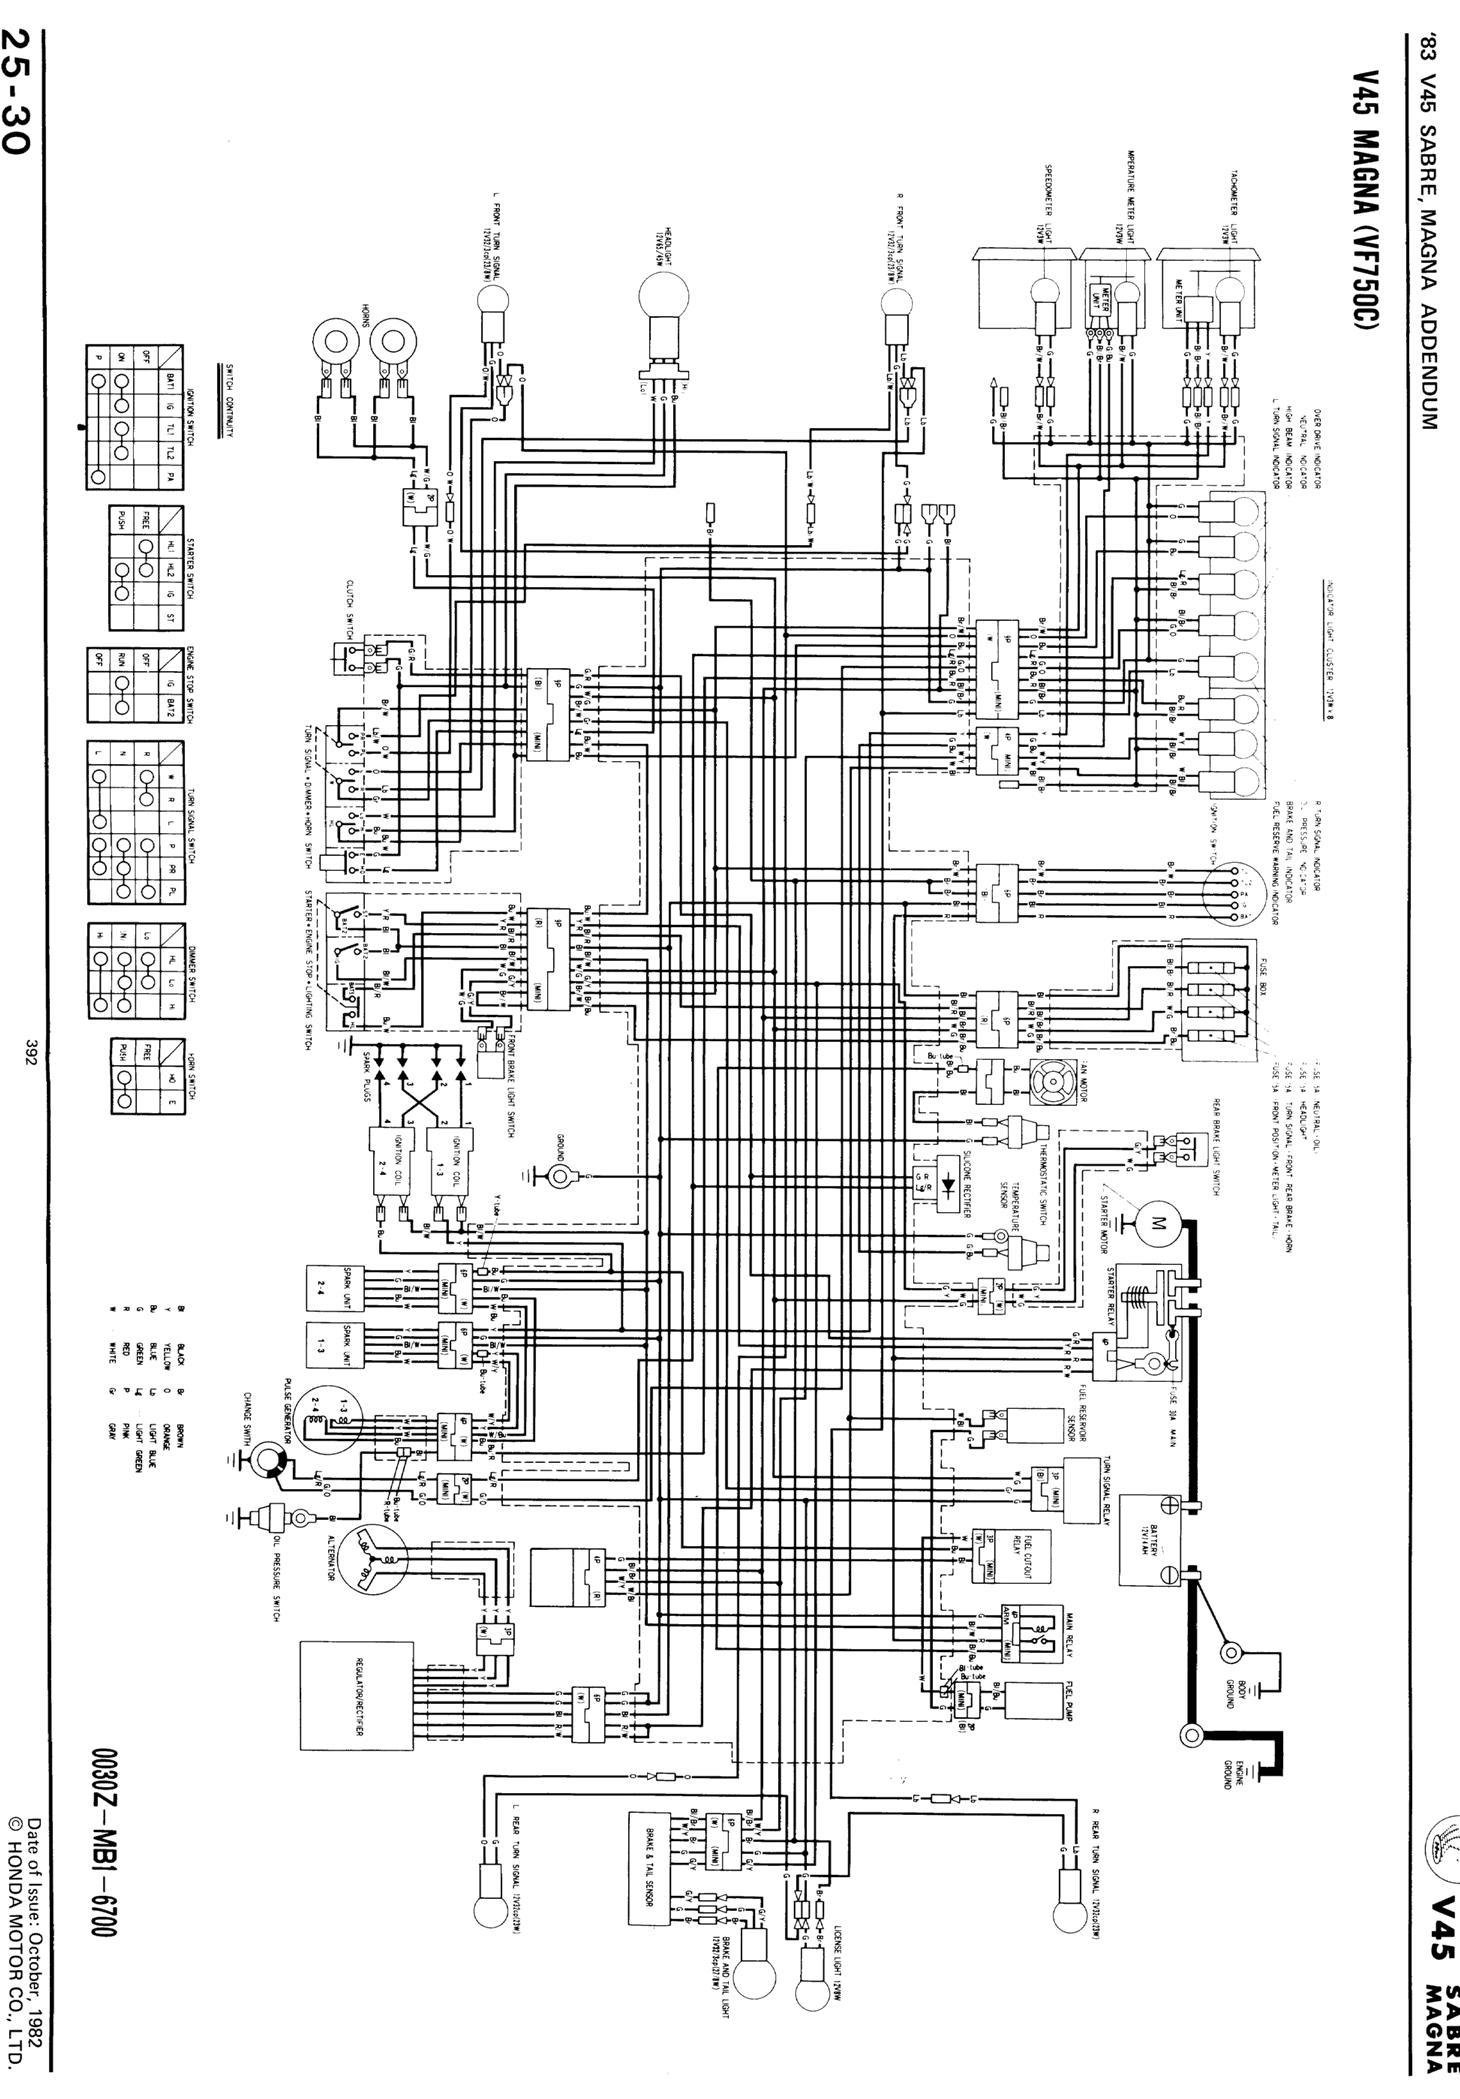 Honda Magna Vf750c Wiring Diagram